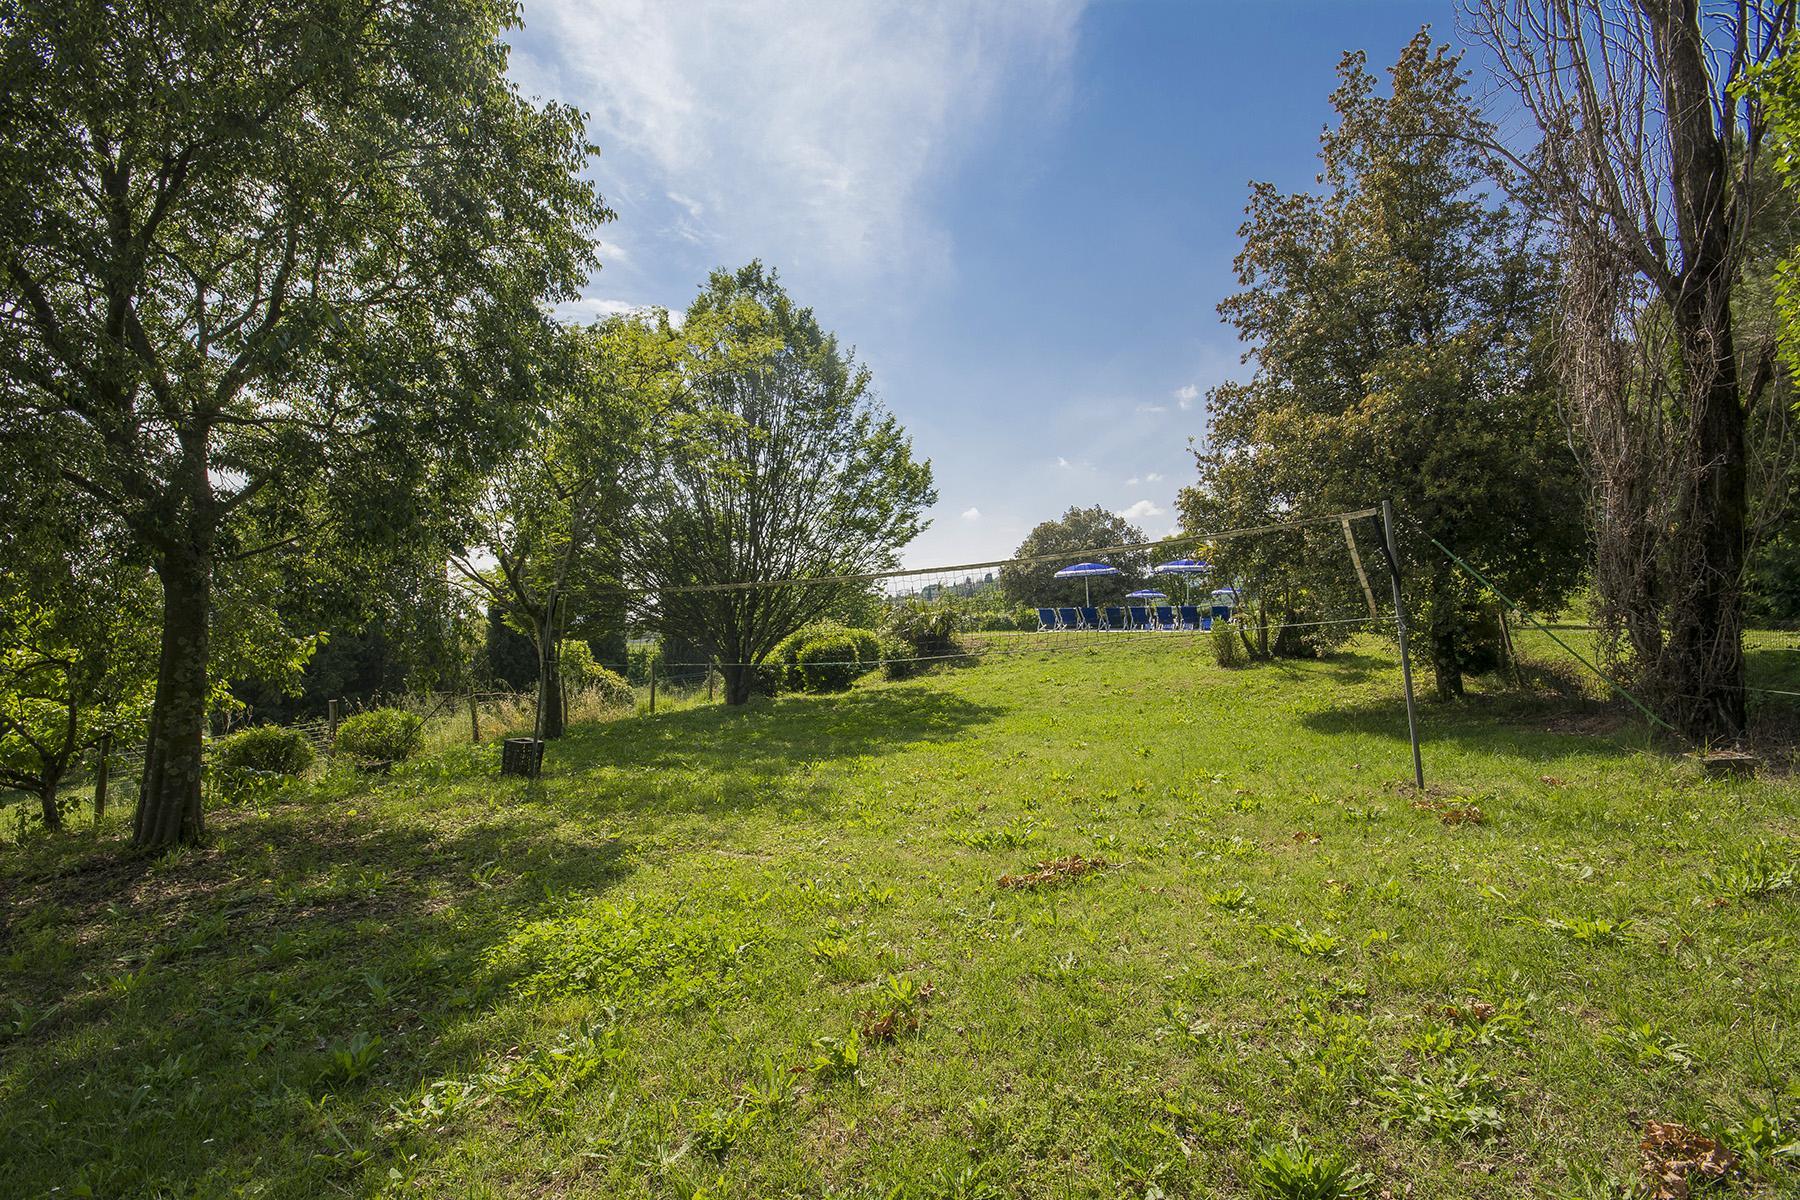 Pescia小山丘上美丽的乡间农舍 - 43